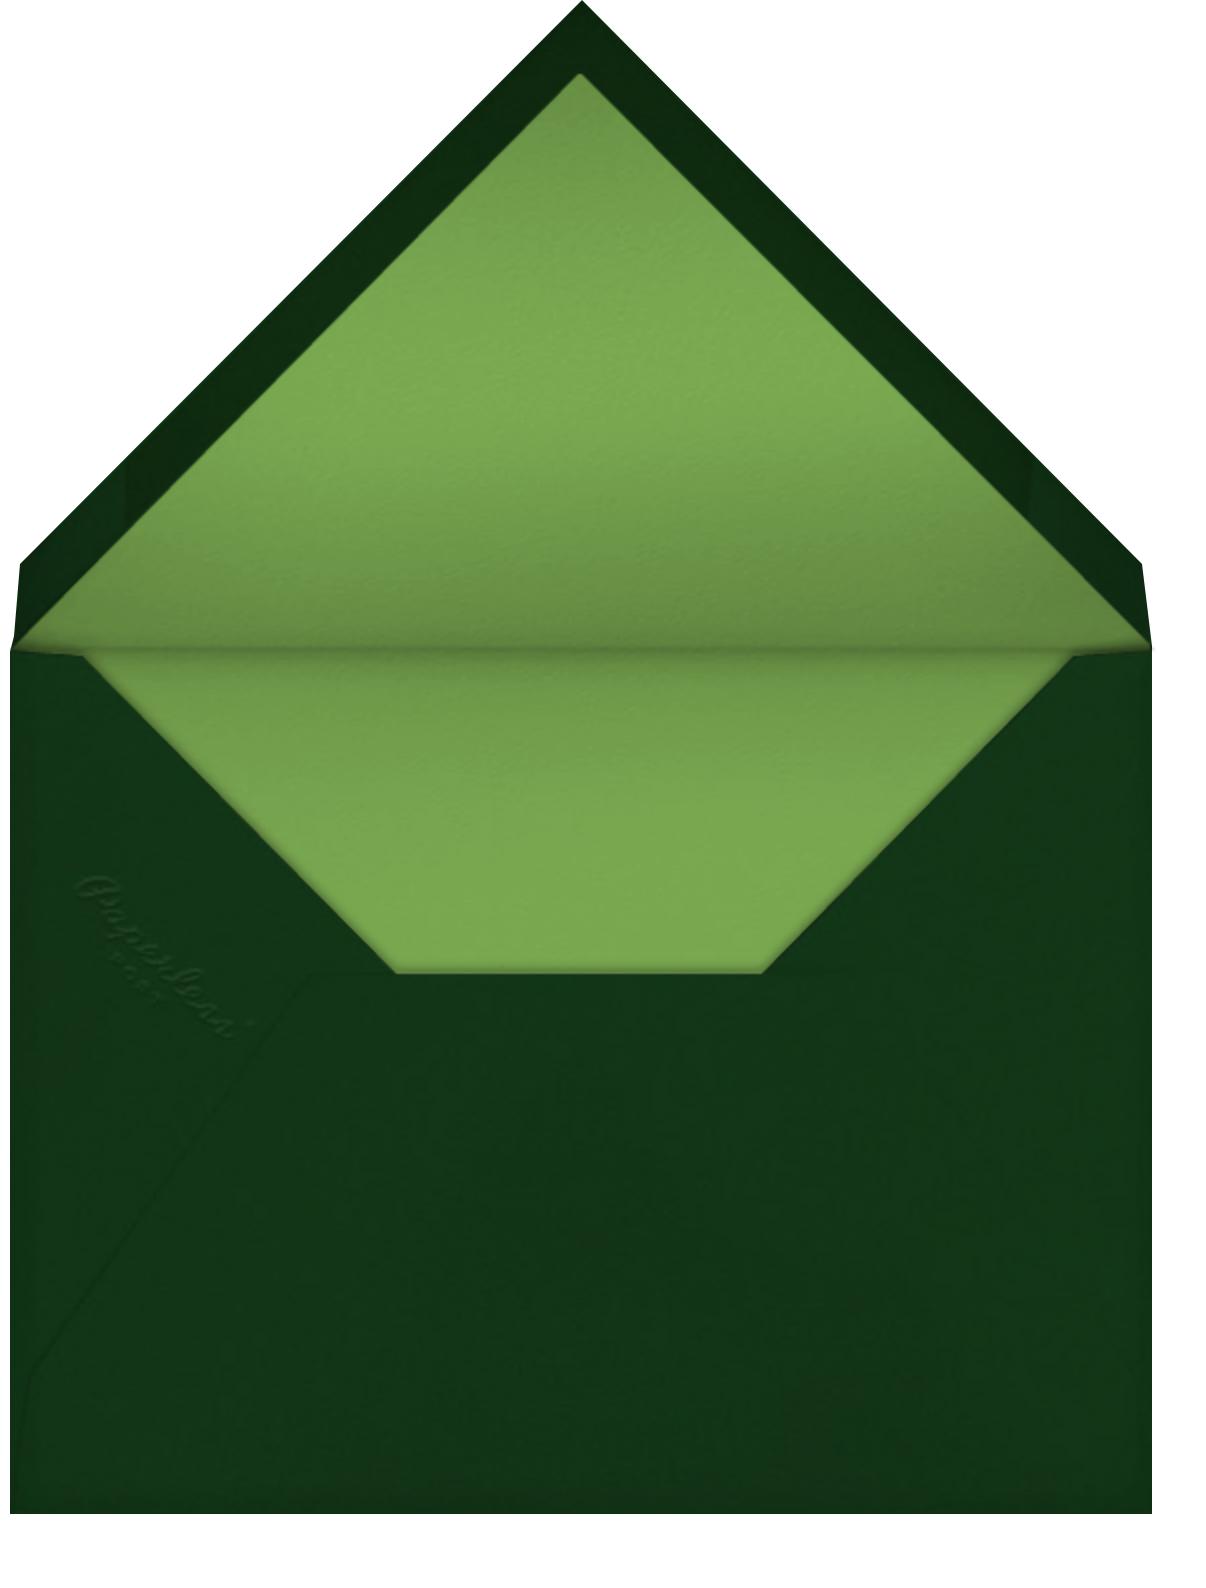 Fern II - Green - Paperless Post - Baptism  - envelope back